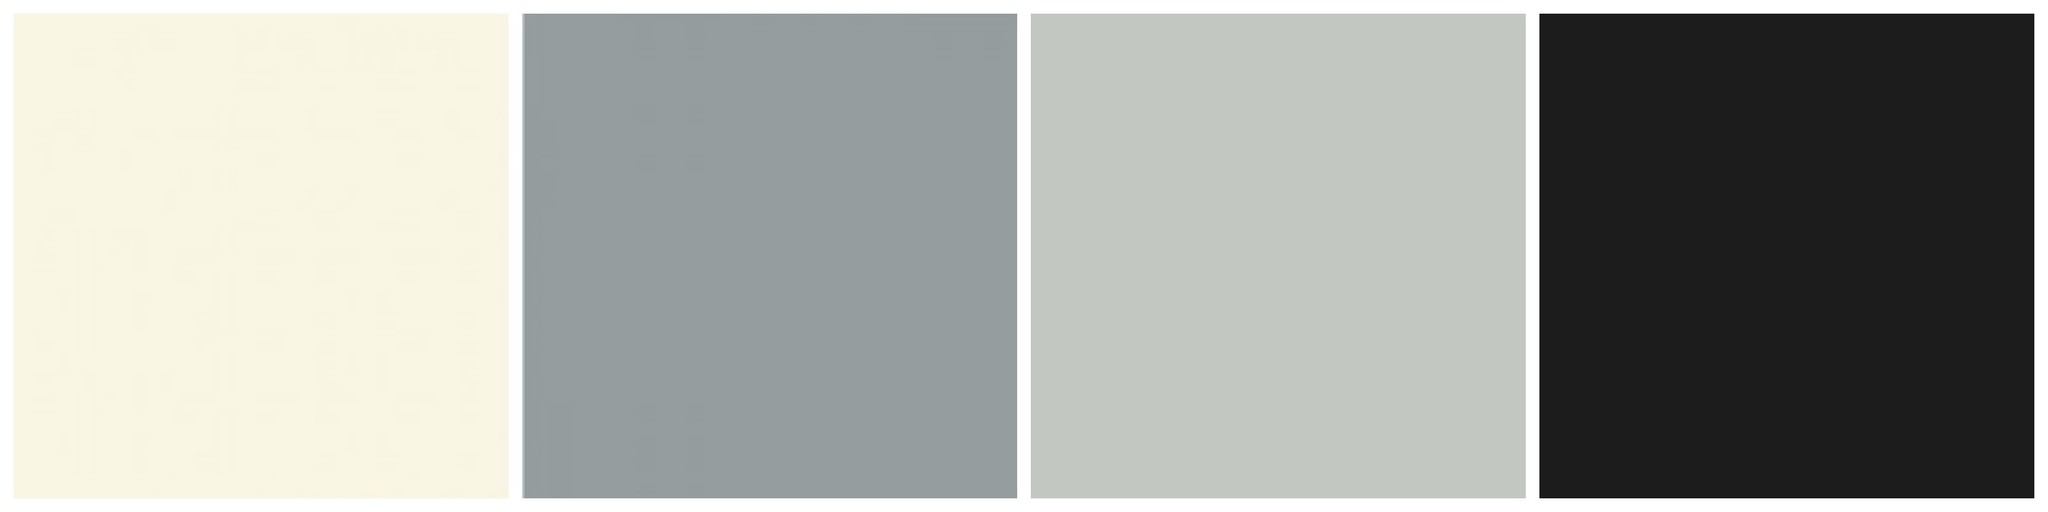 Vloercoating kleuren woonkamer